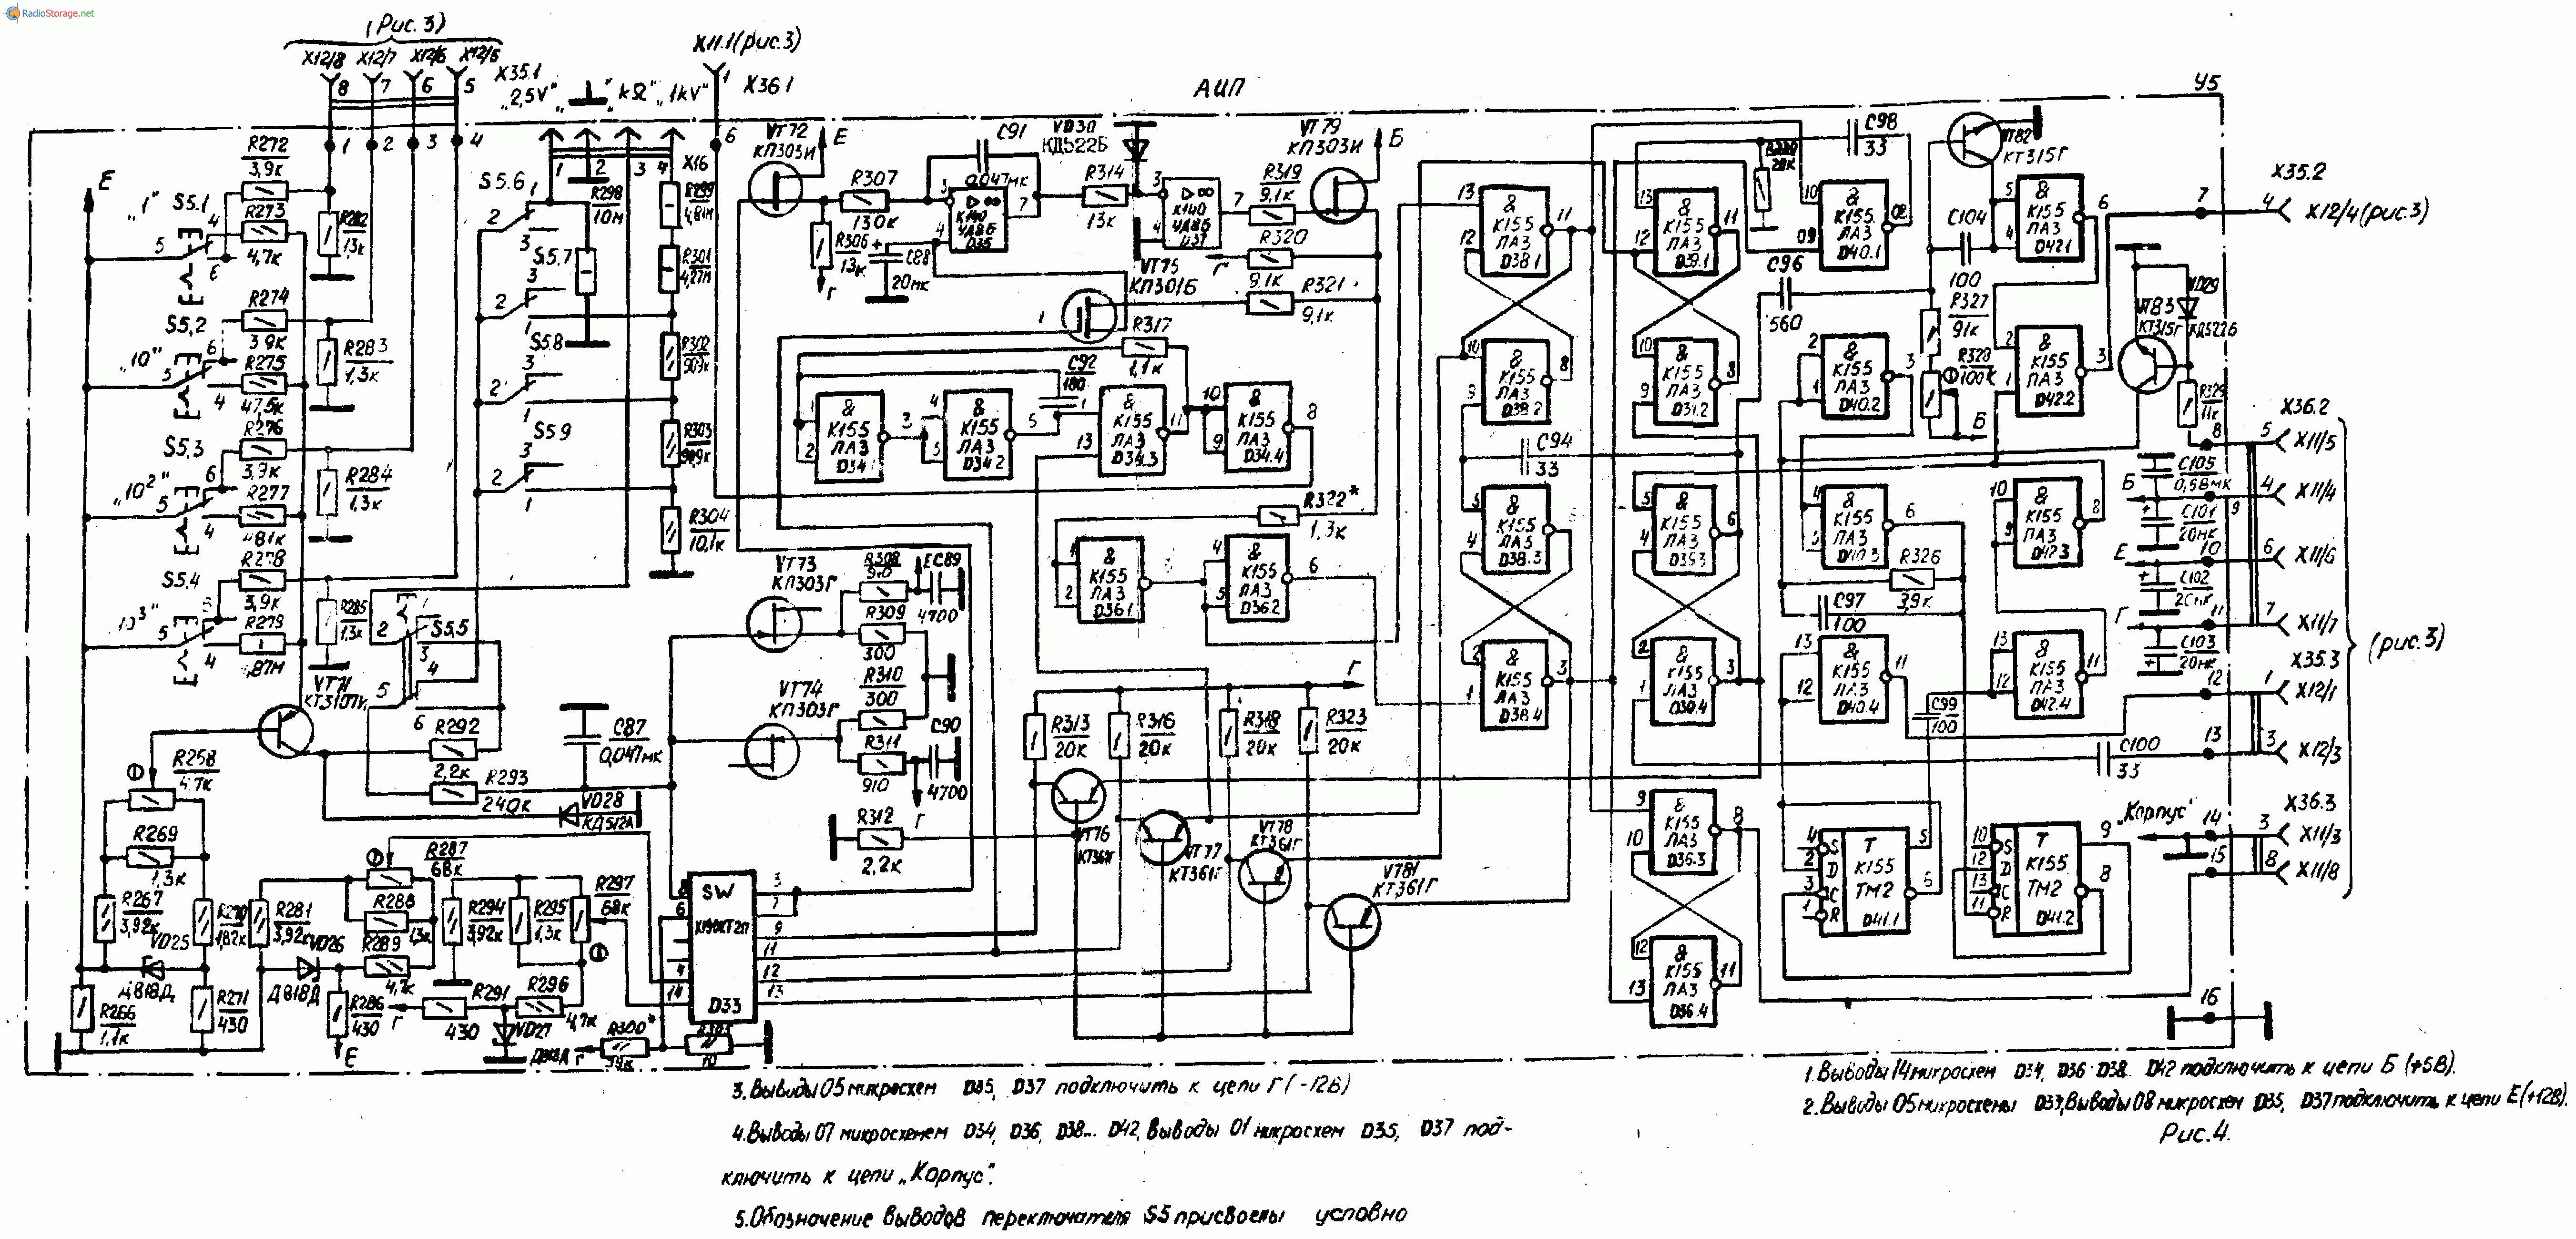 Схема осциллографа с1 112а фото 181